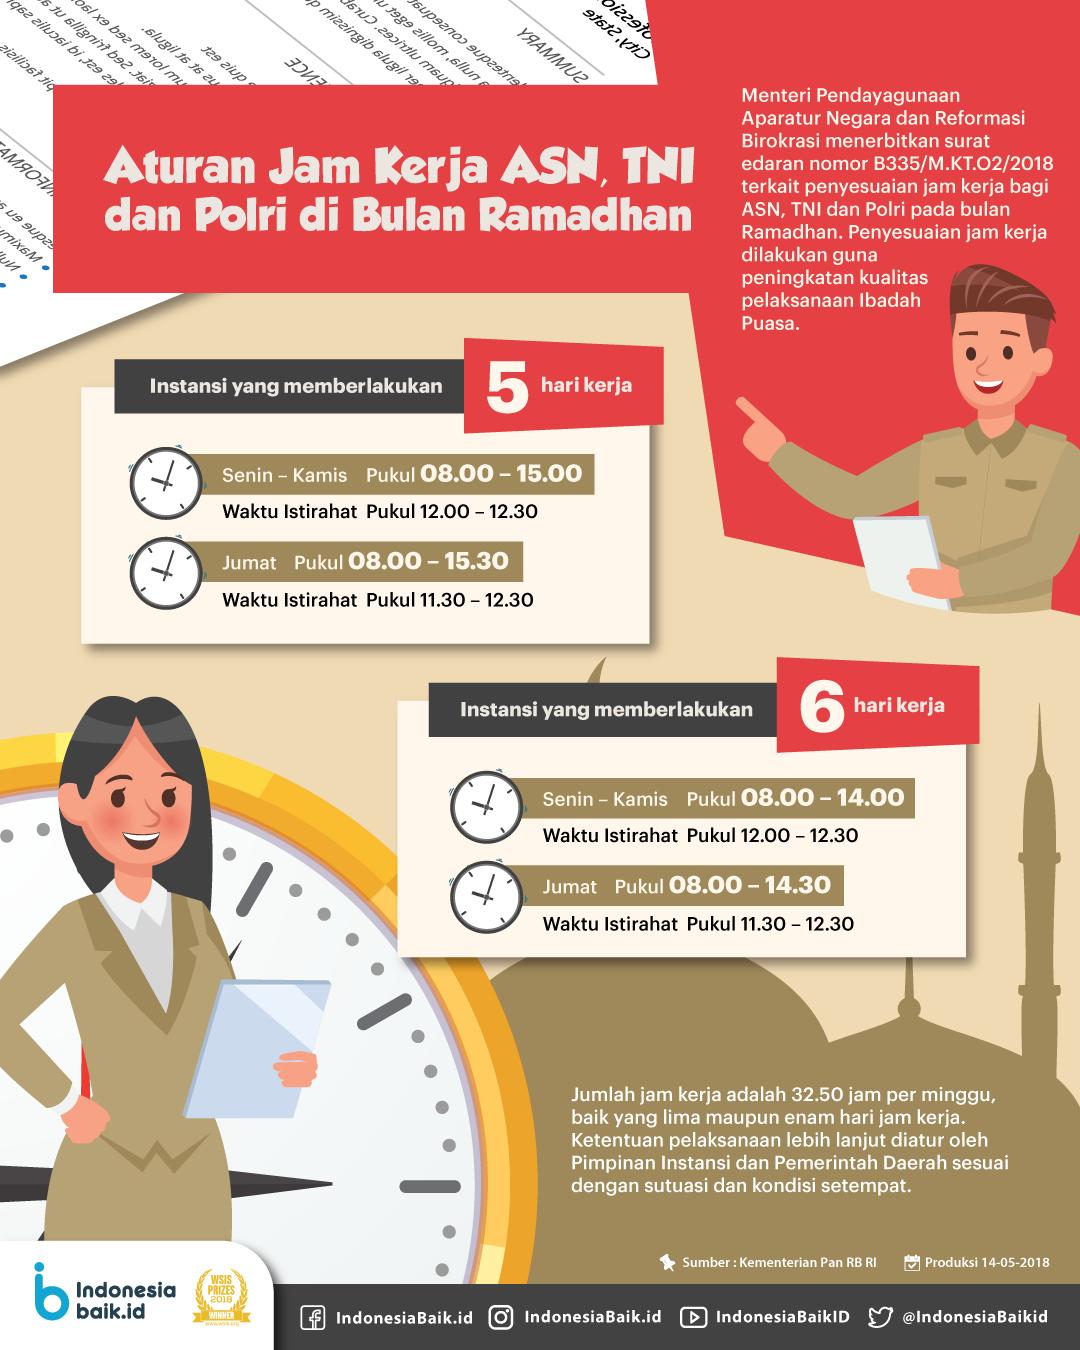 Aturan Jam Kerja ASN, TNI, dan Polri di Bulan Ramadhan